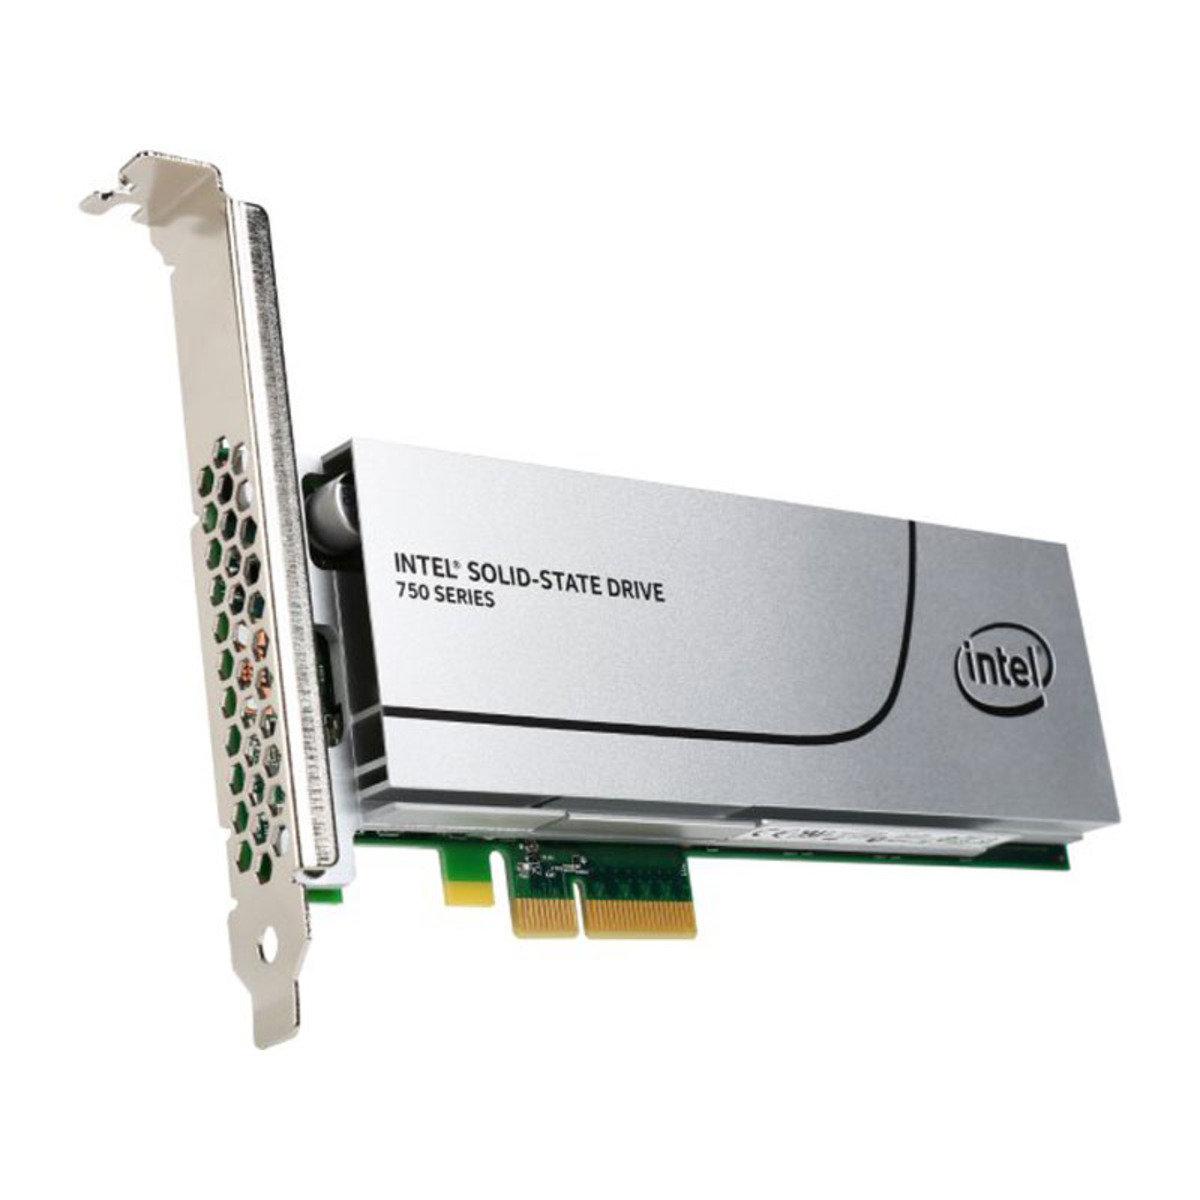 SSD 超高速NVMe內置固態硬碟 750系列AIC 800GB